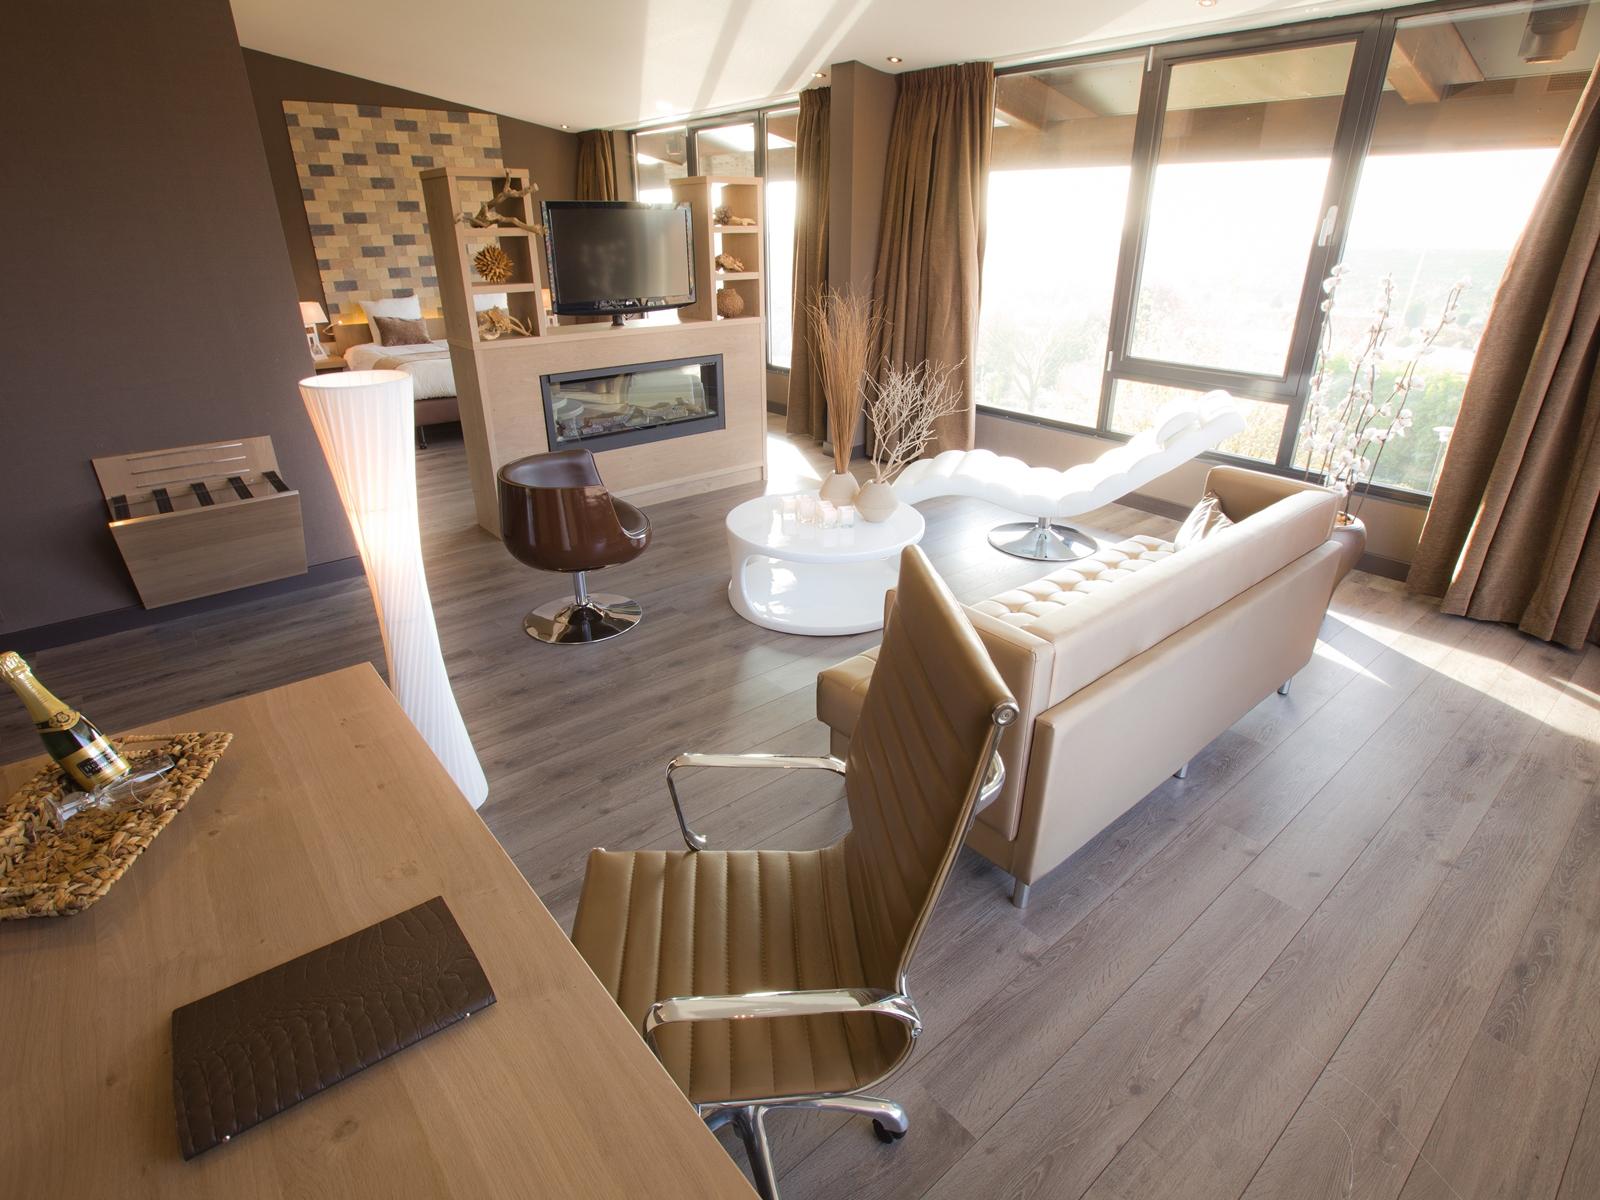 goedkope suites nederland